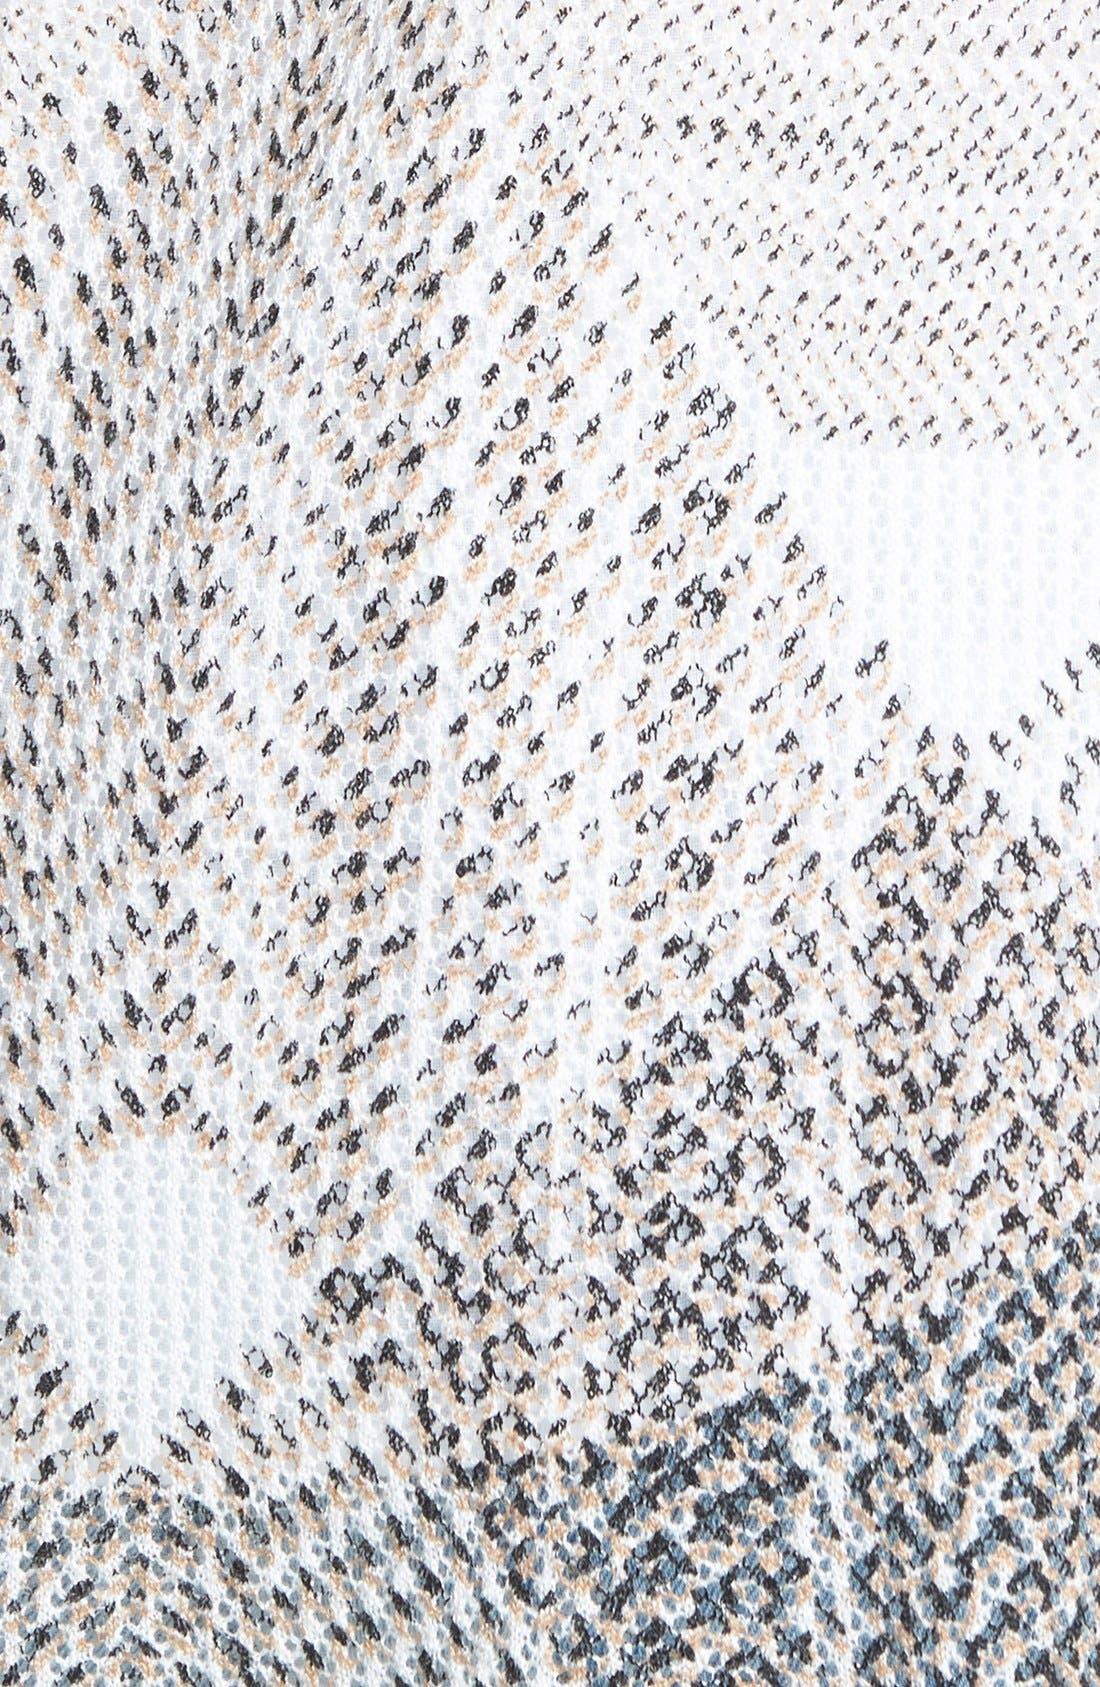 Alternate Image 3  - NIC+ZOE 'Dashed Diamonds' Long Cardigan (Regular & Petite)